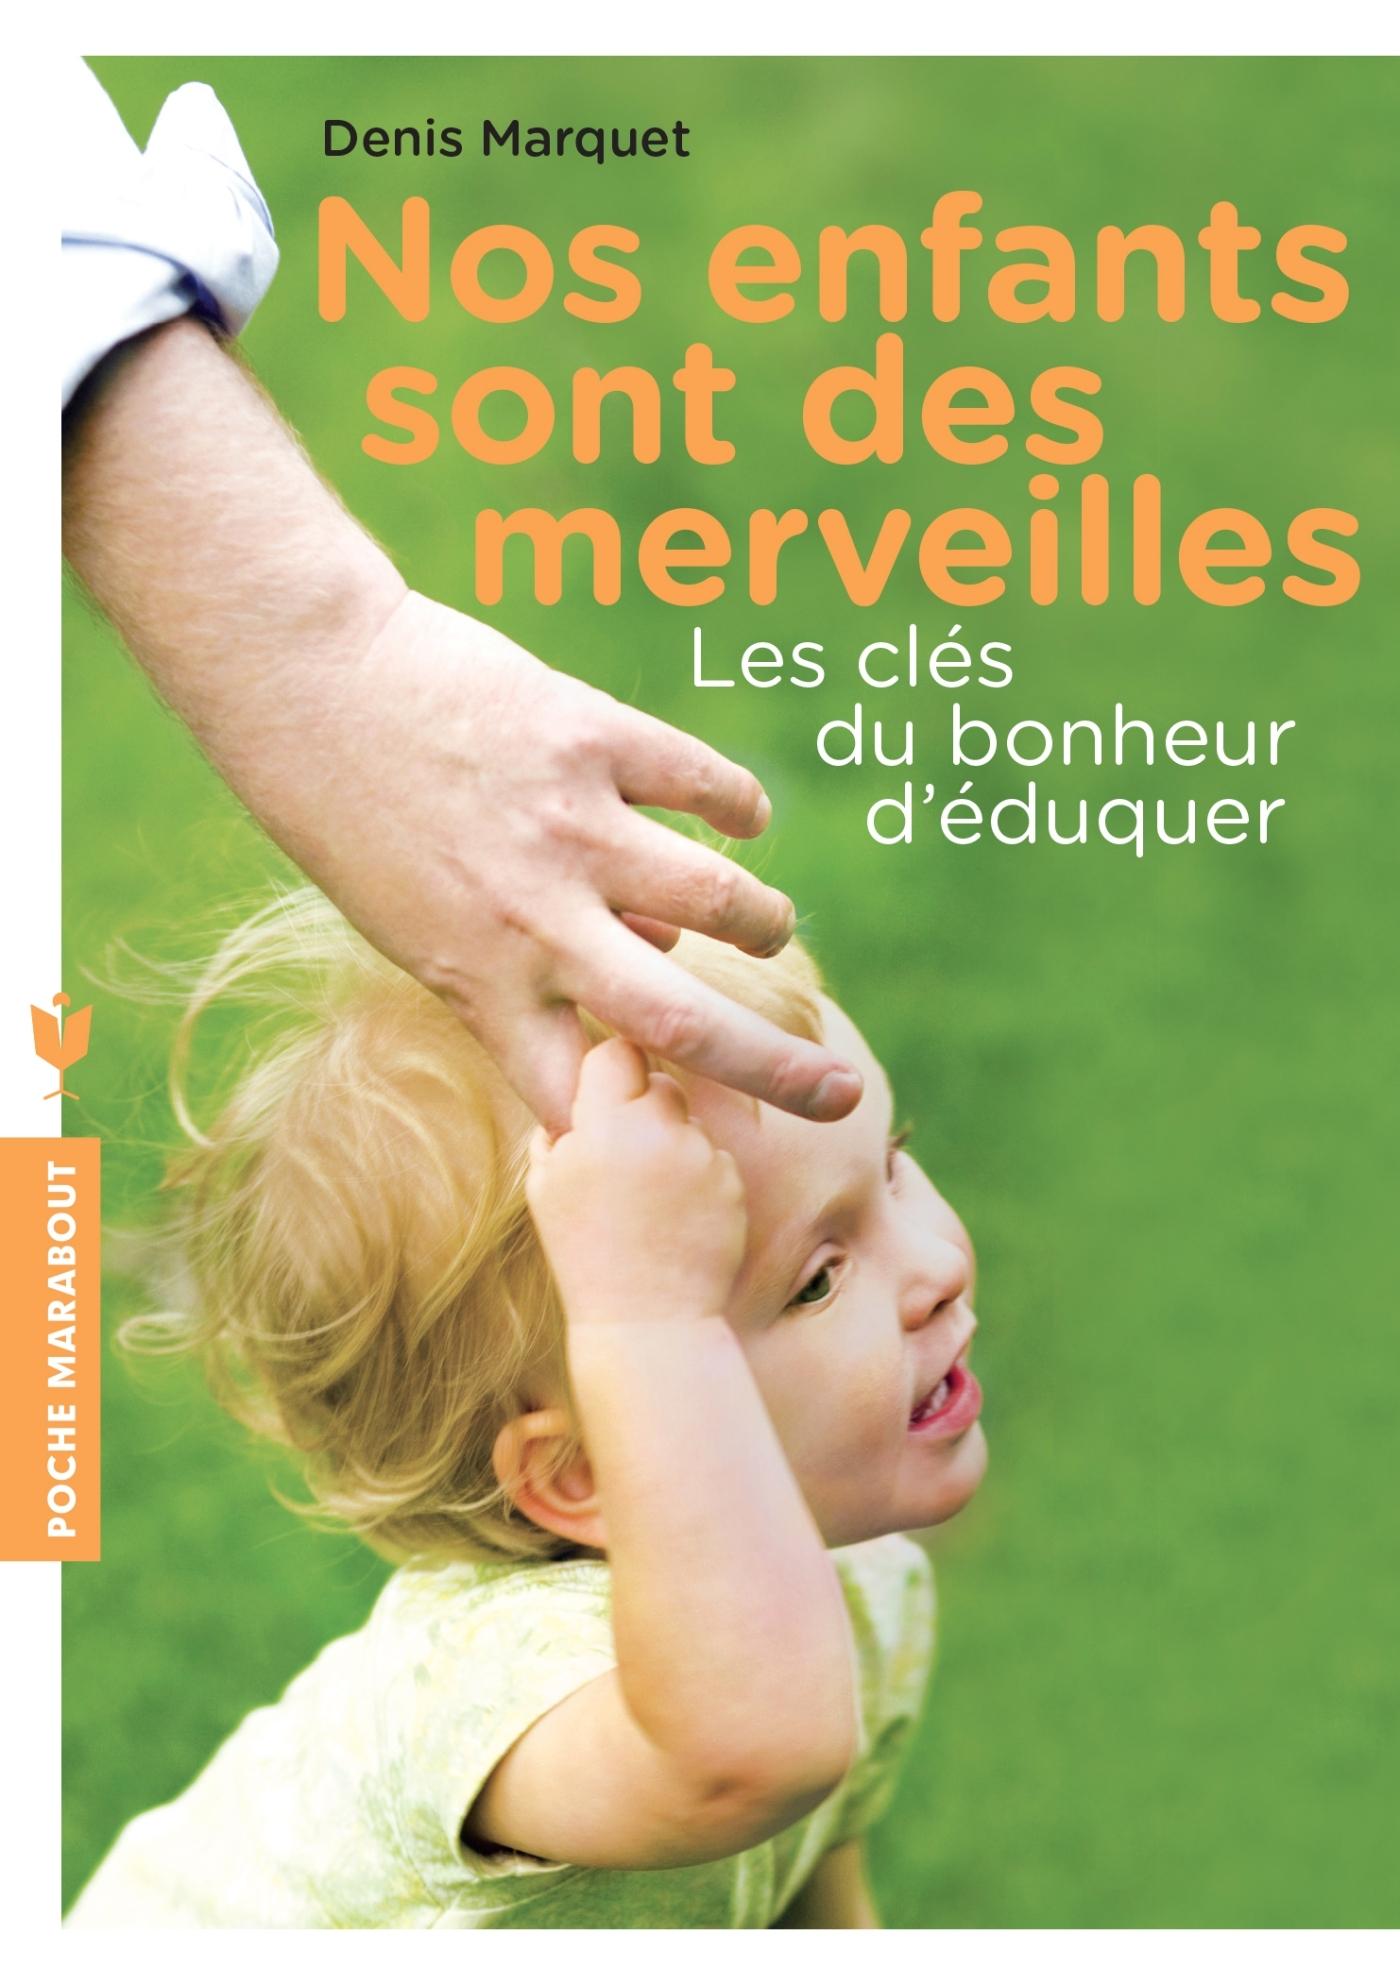 NOS ENFANTS SONT DES MERVEILLES